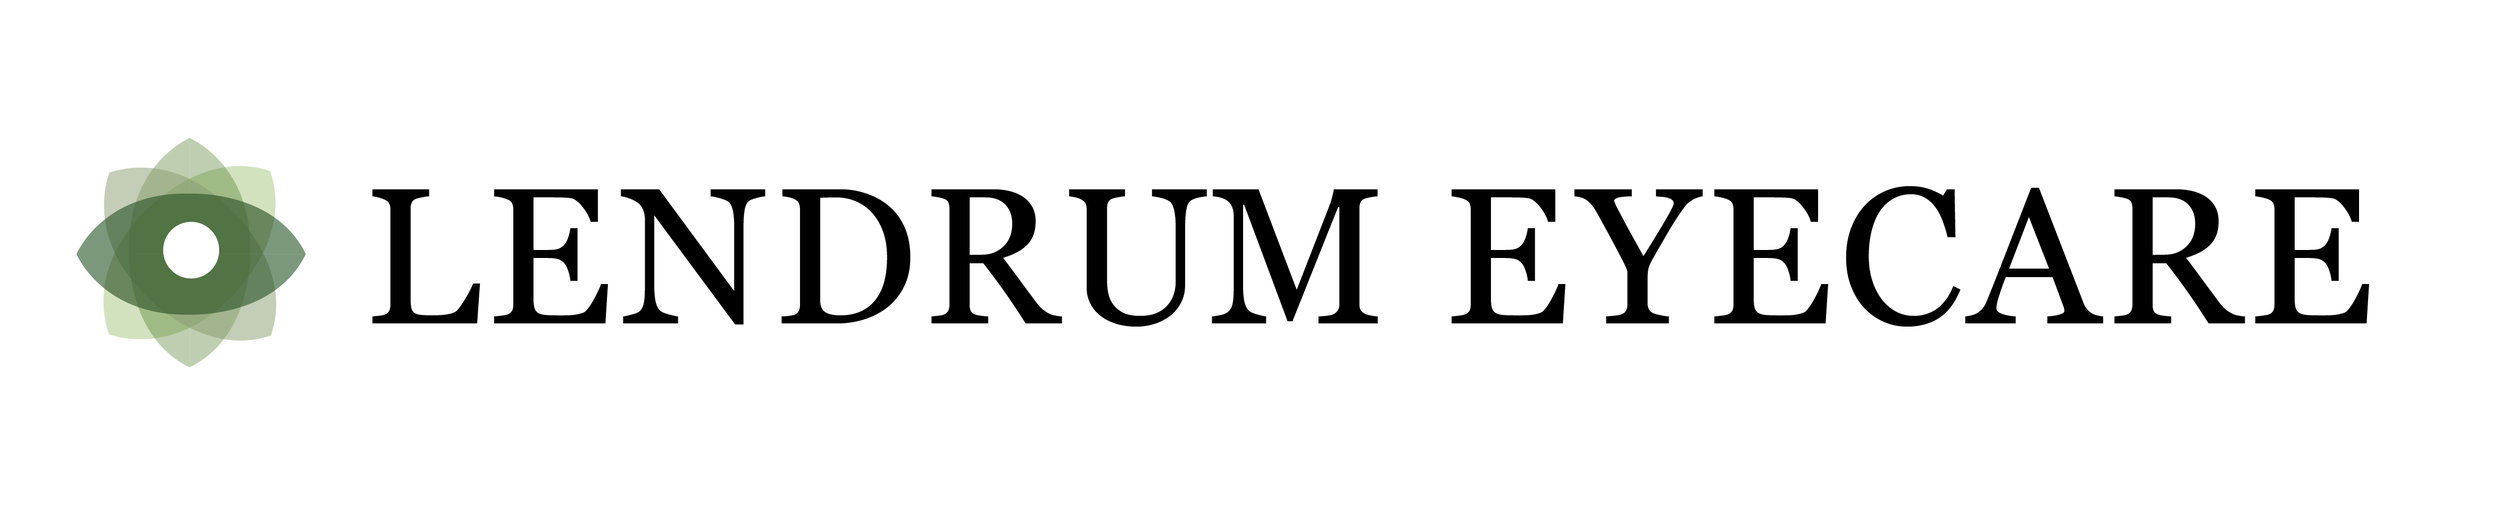 Lendrum_Logo_Final.jpg